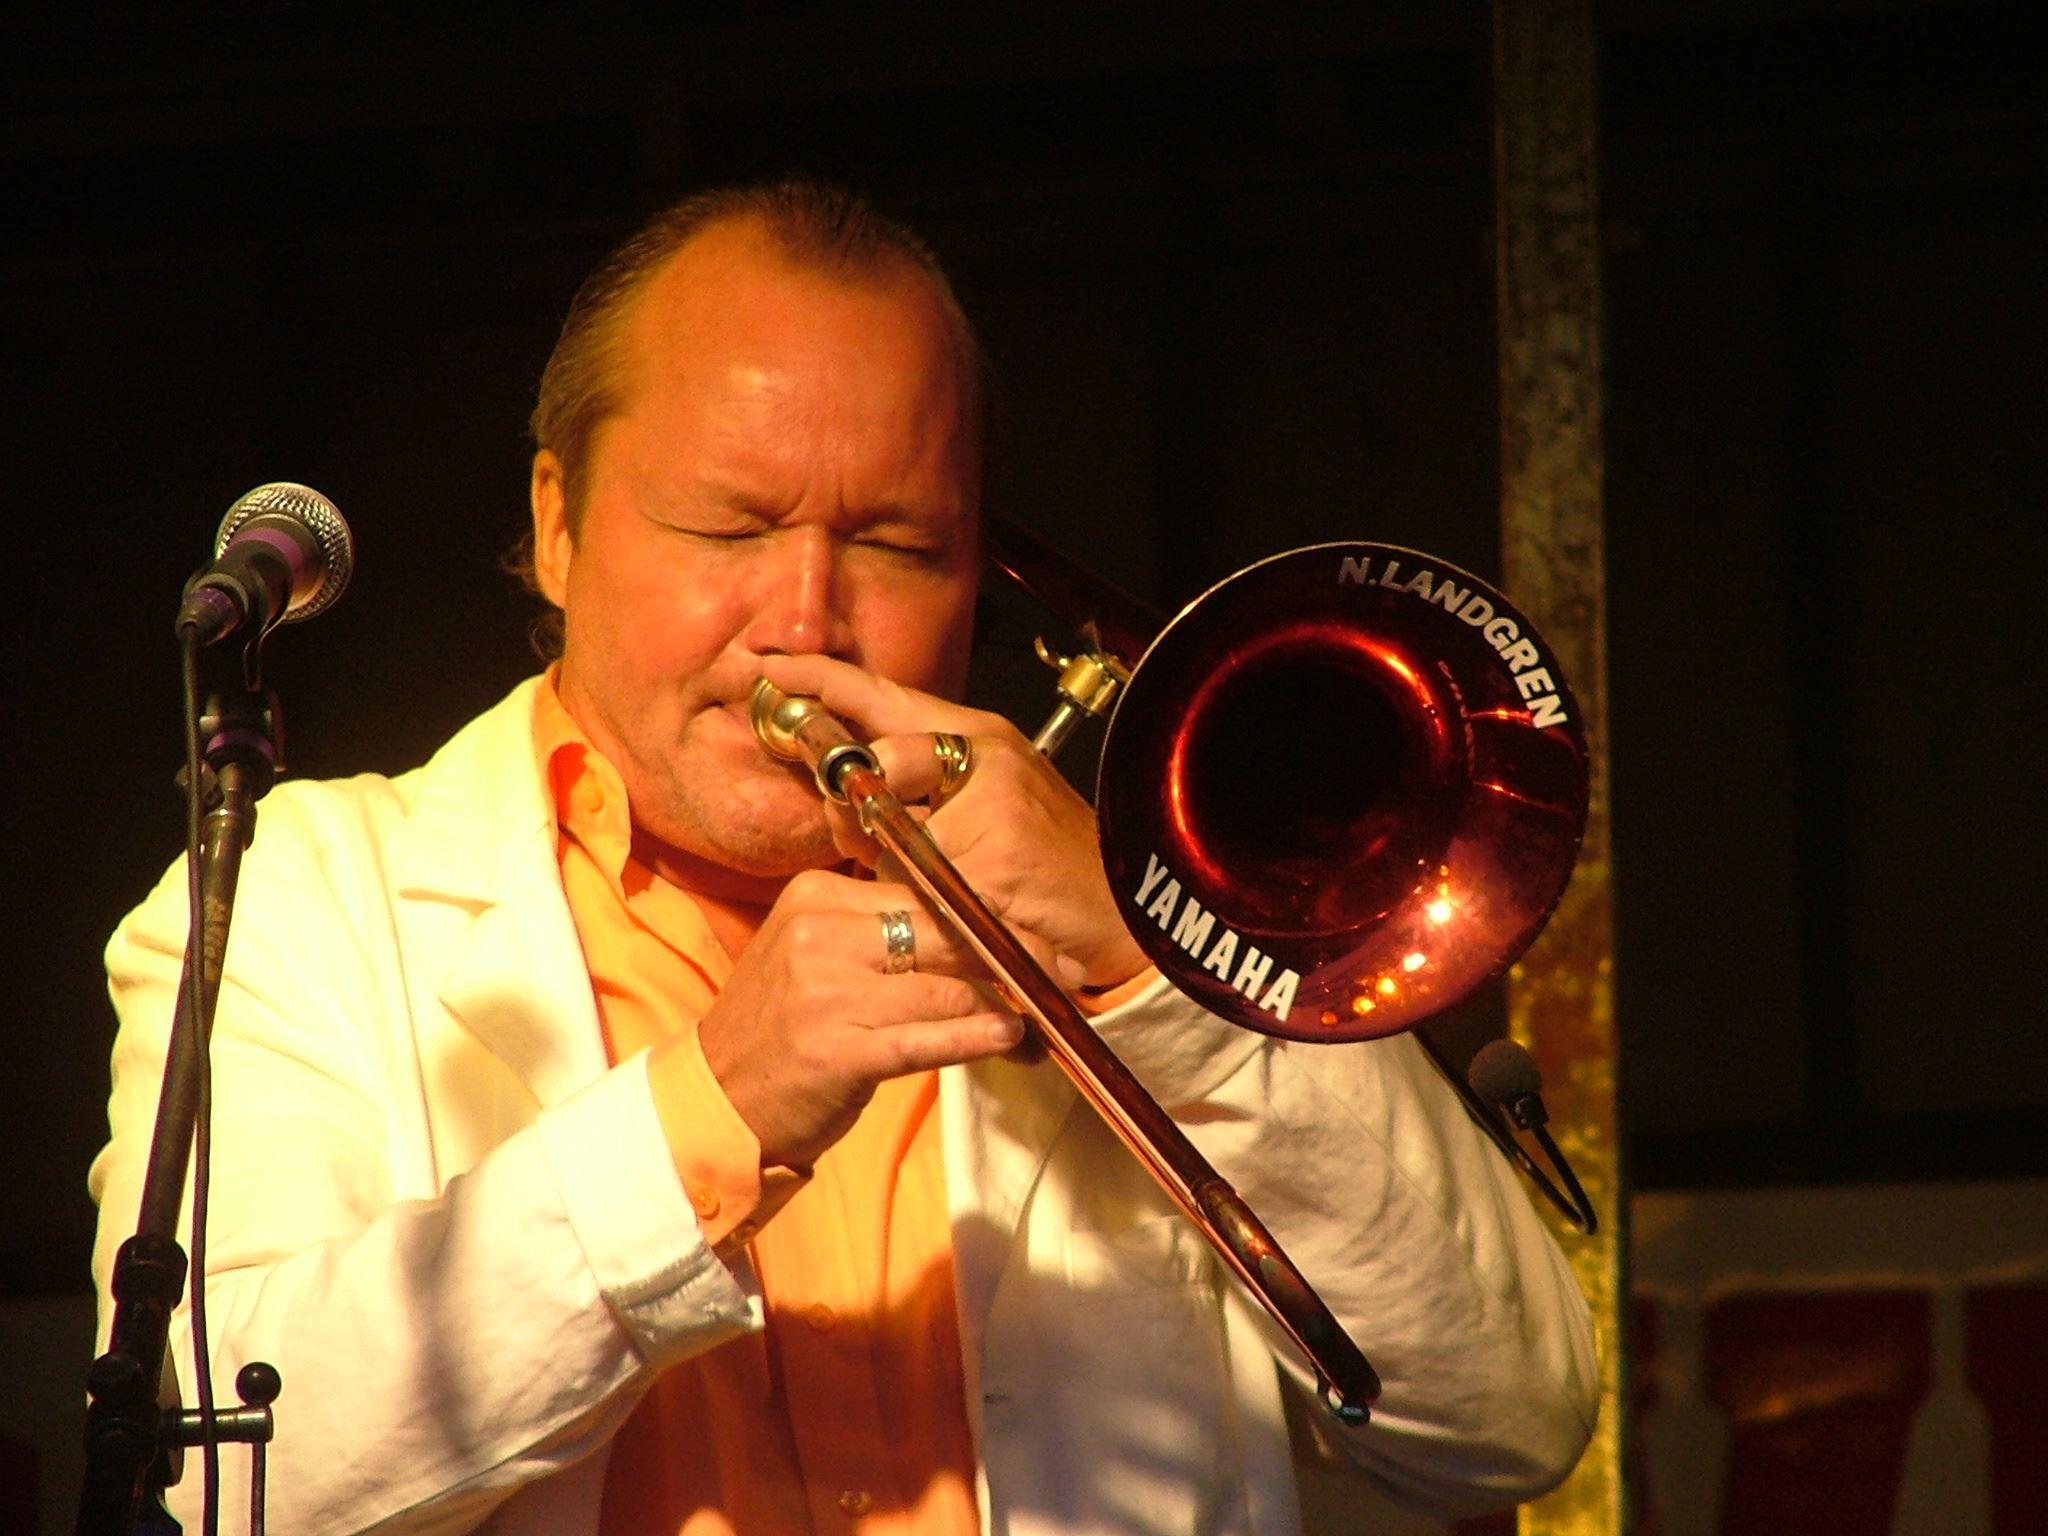 Jazz under the stars - Nils Landgren Funk Unit